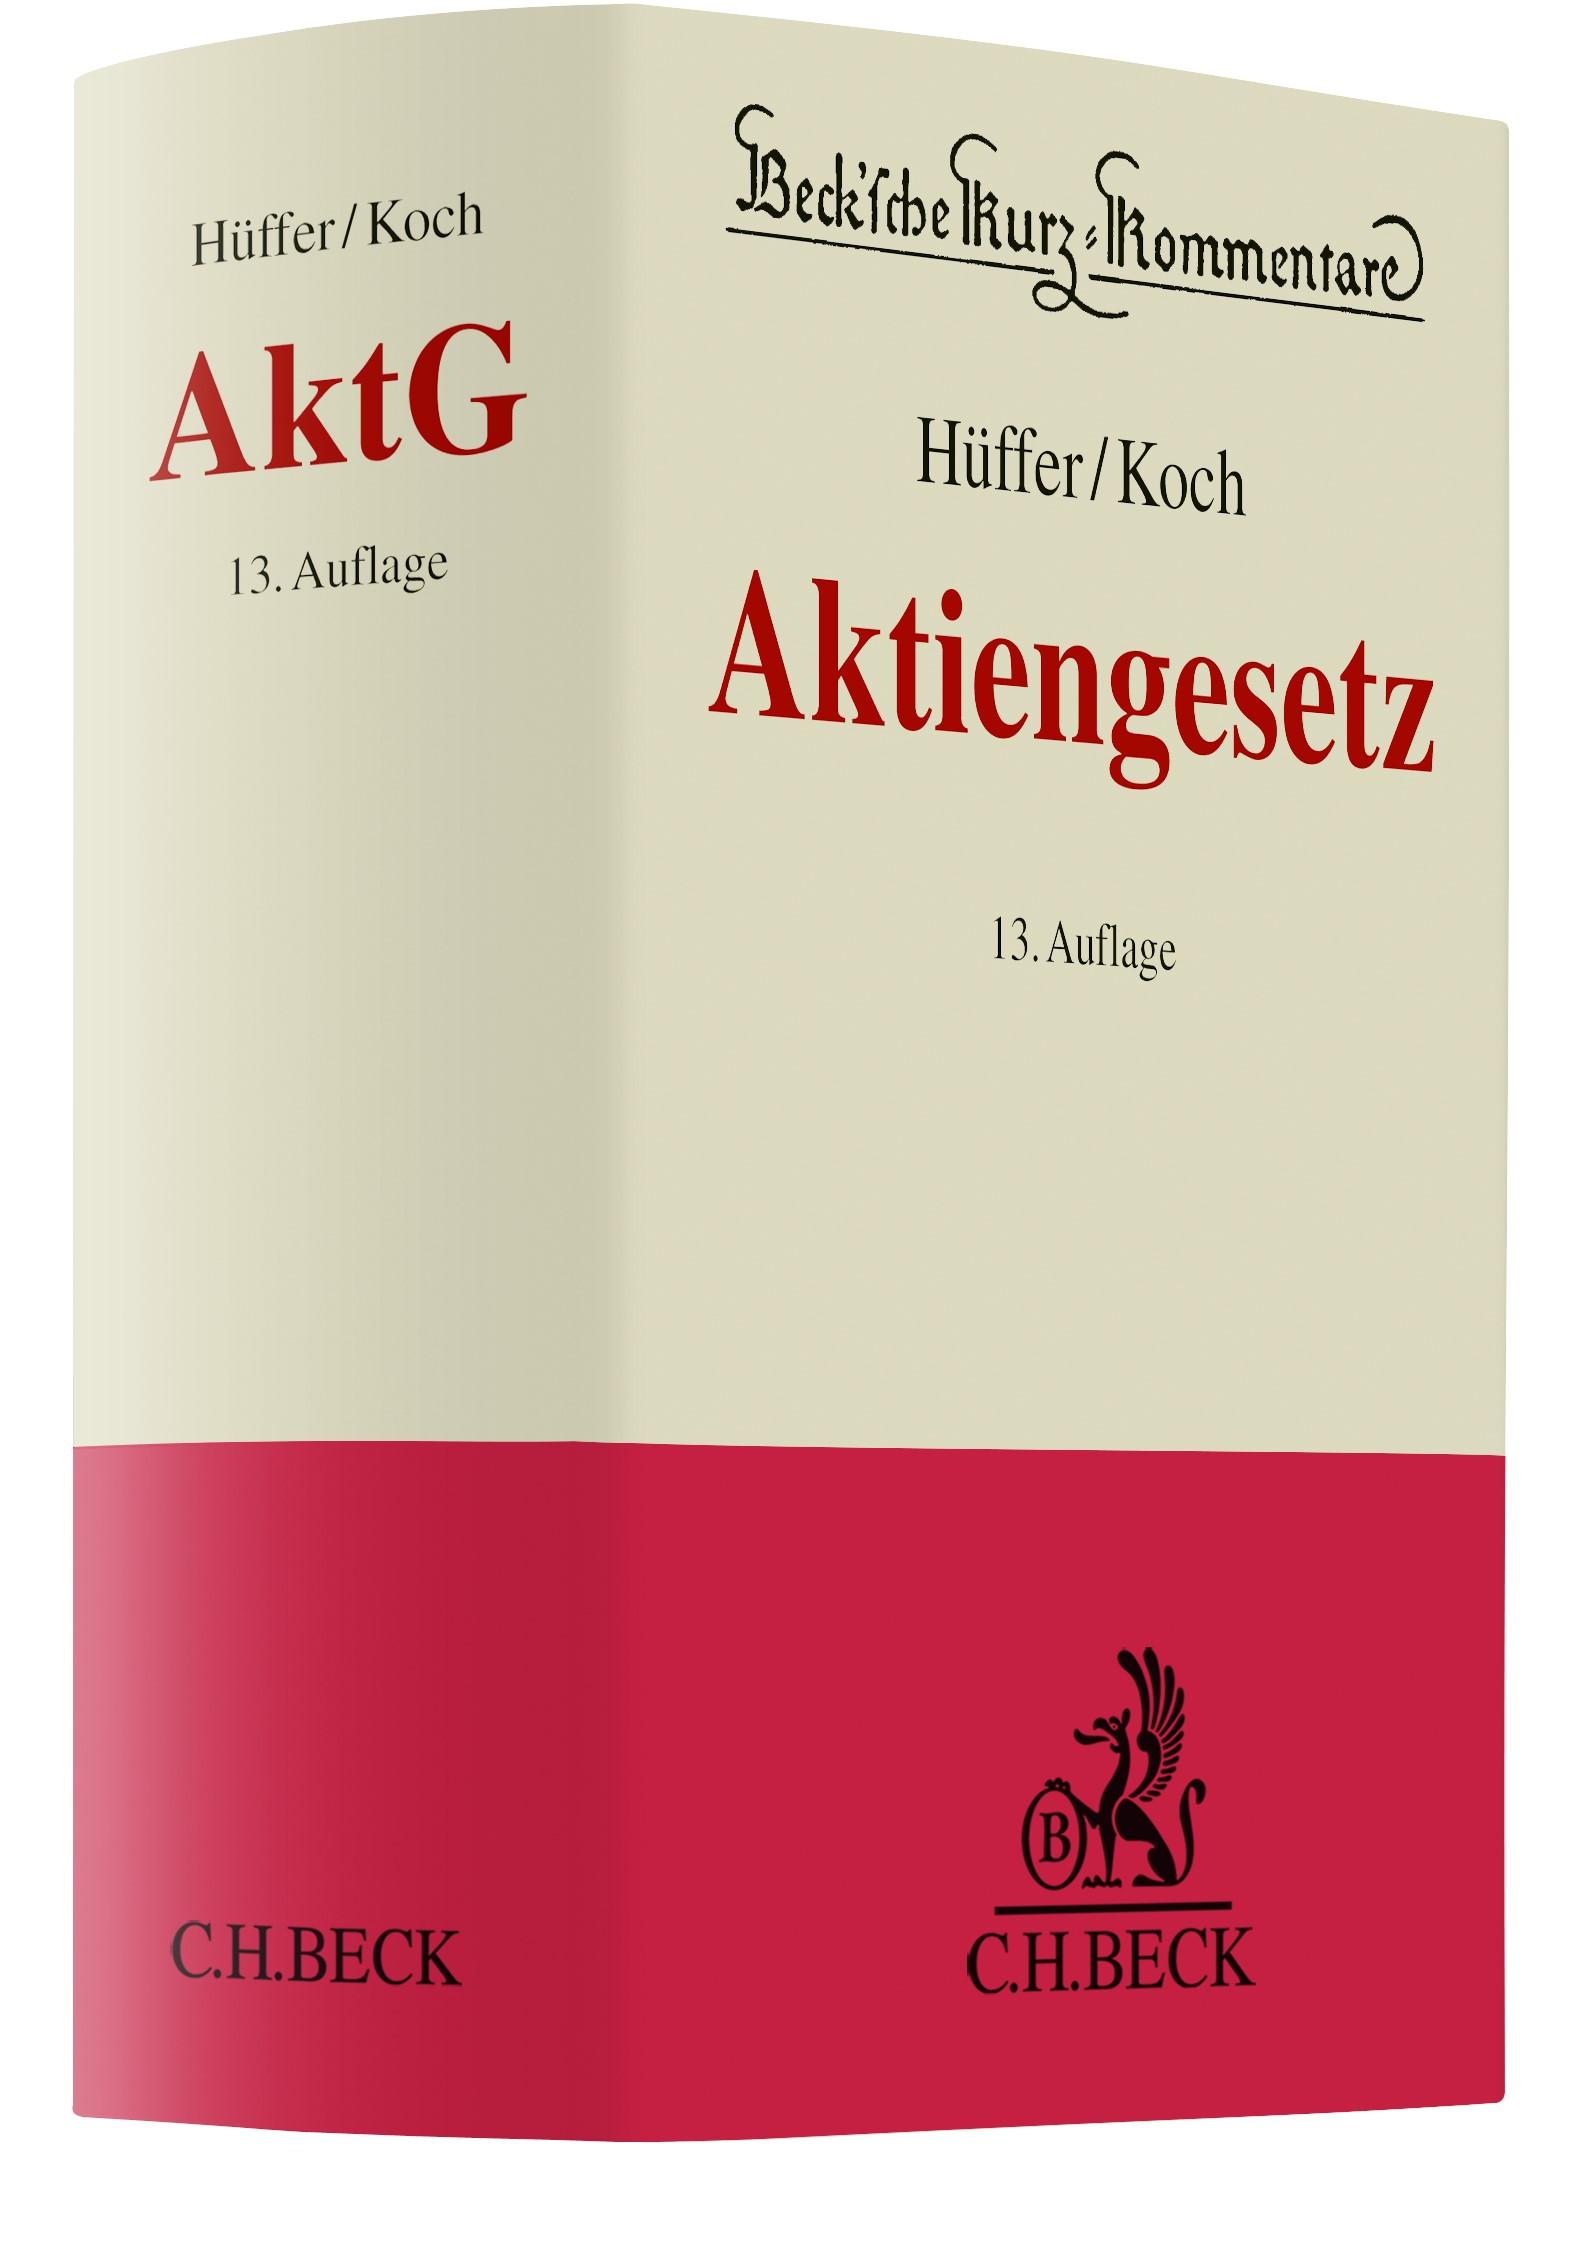 Aktiengesetz: AktG | Hüffer / Koch | 13. Auflage, 2018 | Buch (Cover)